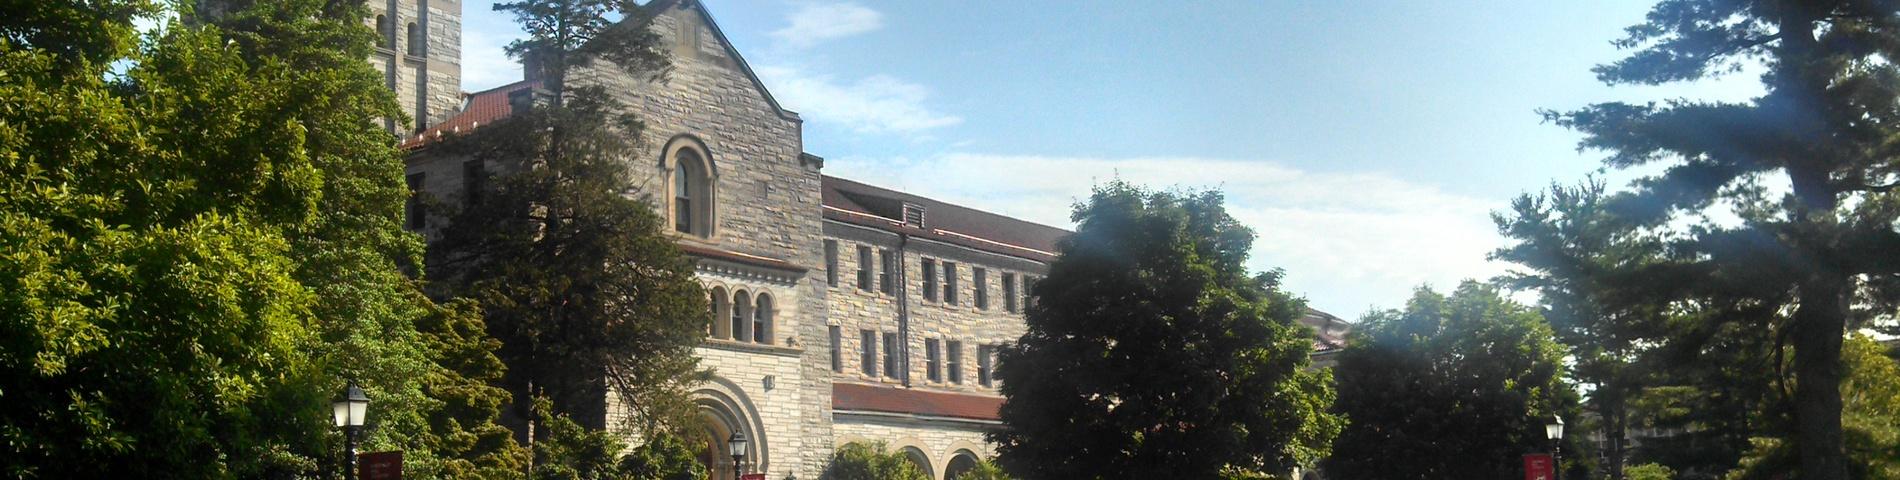 FLS - Chesnut Hill College Bild 1